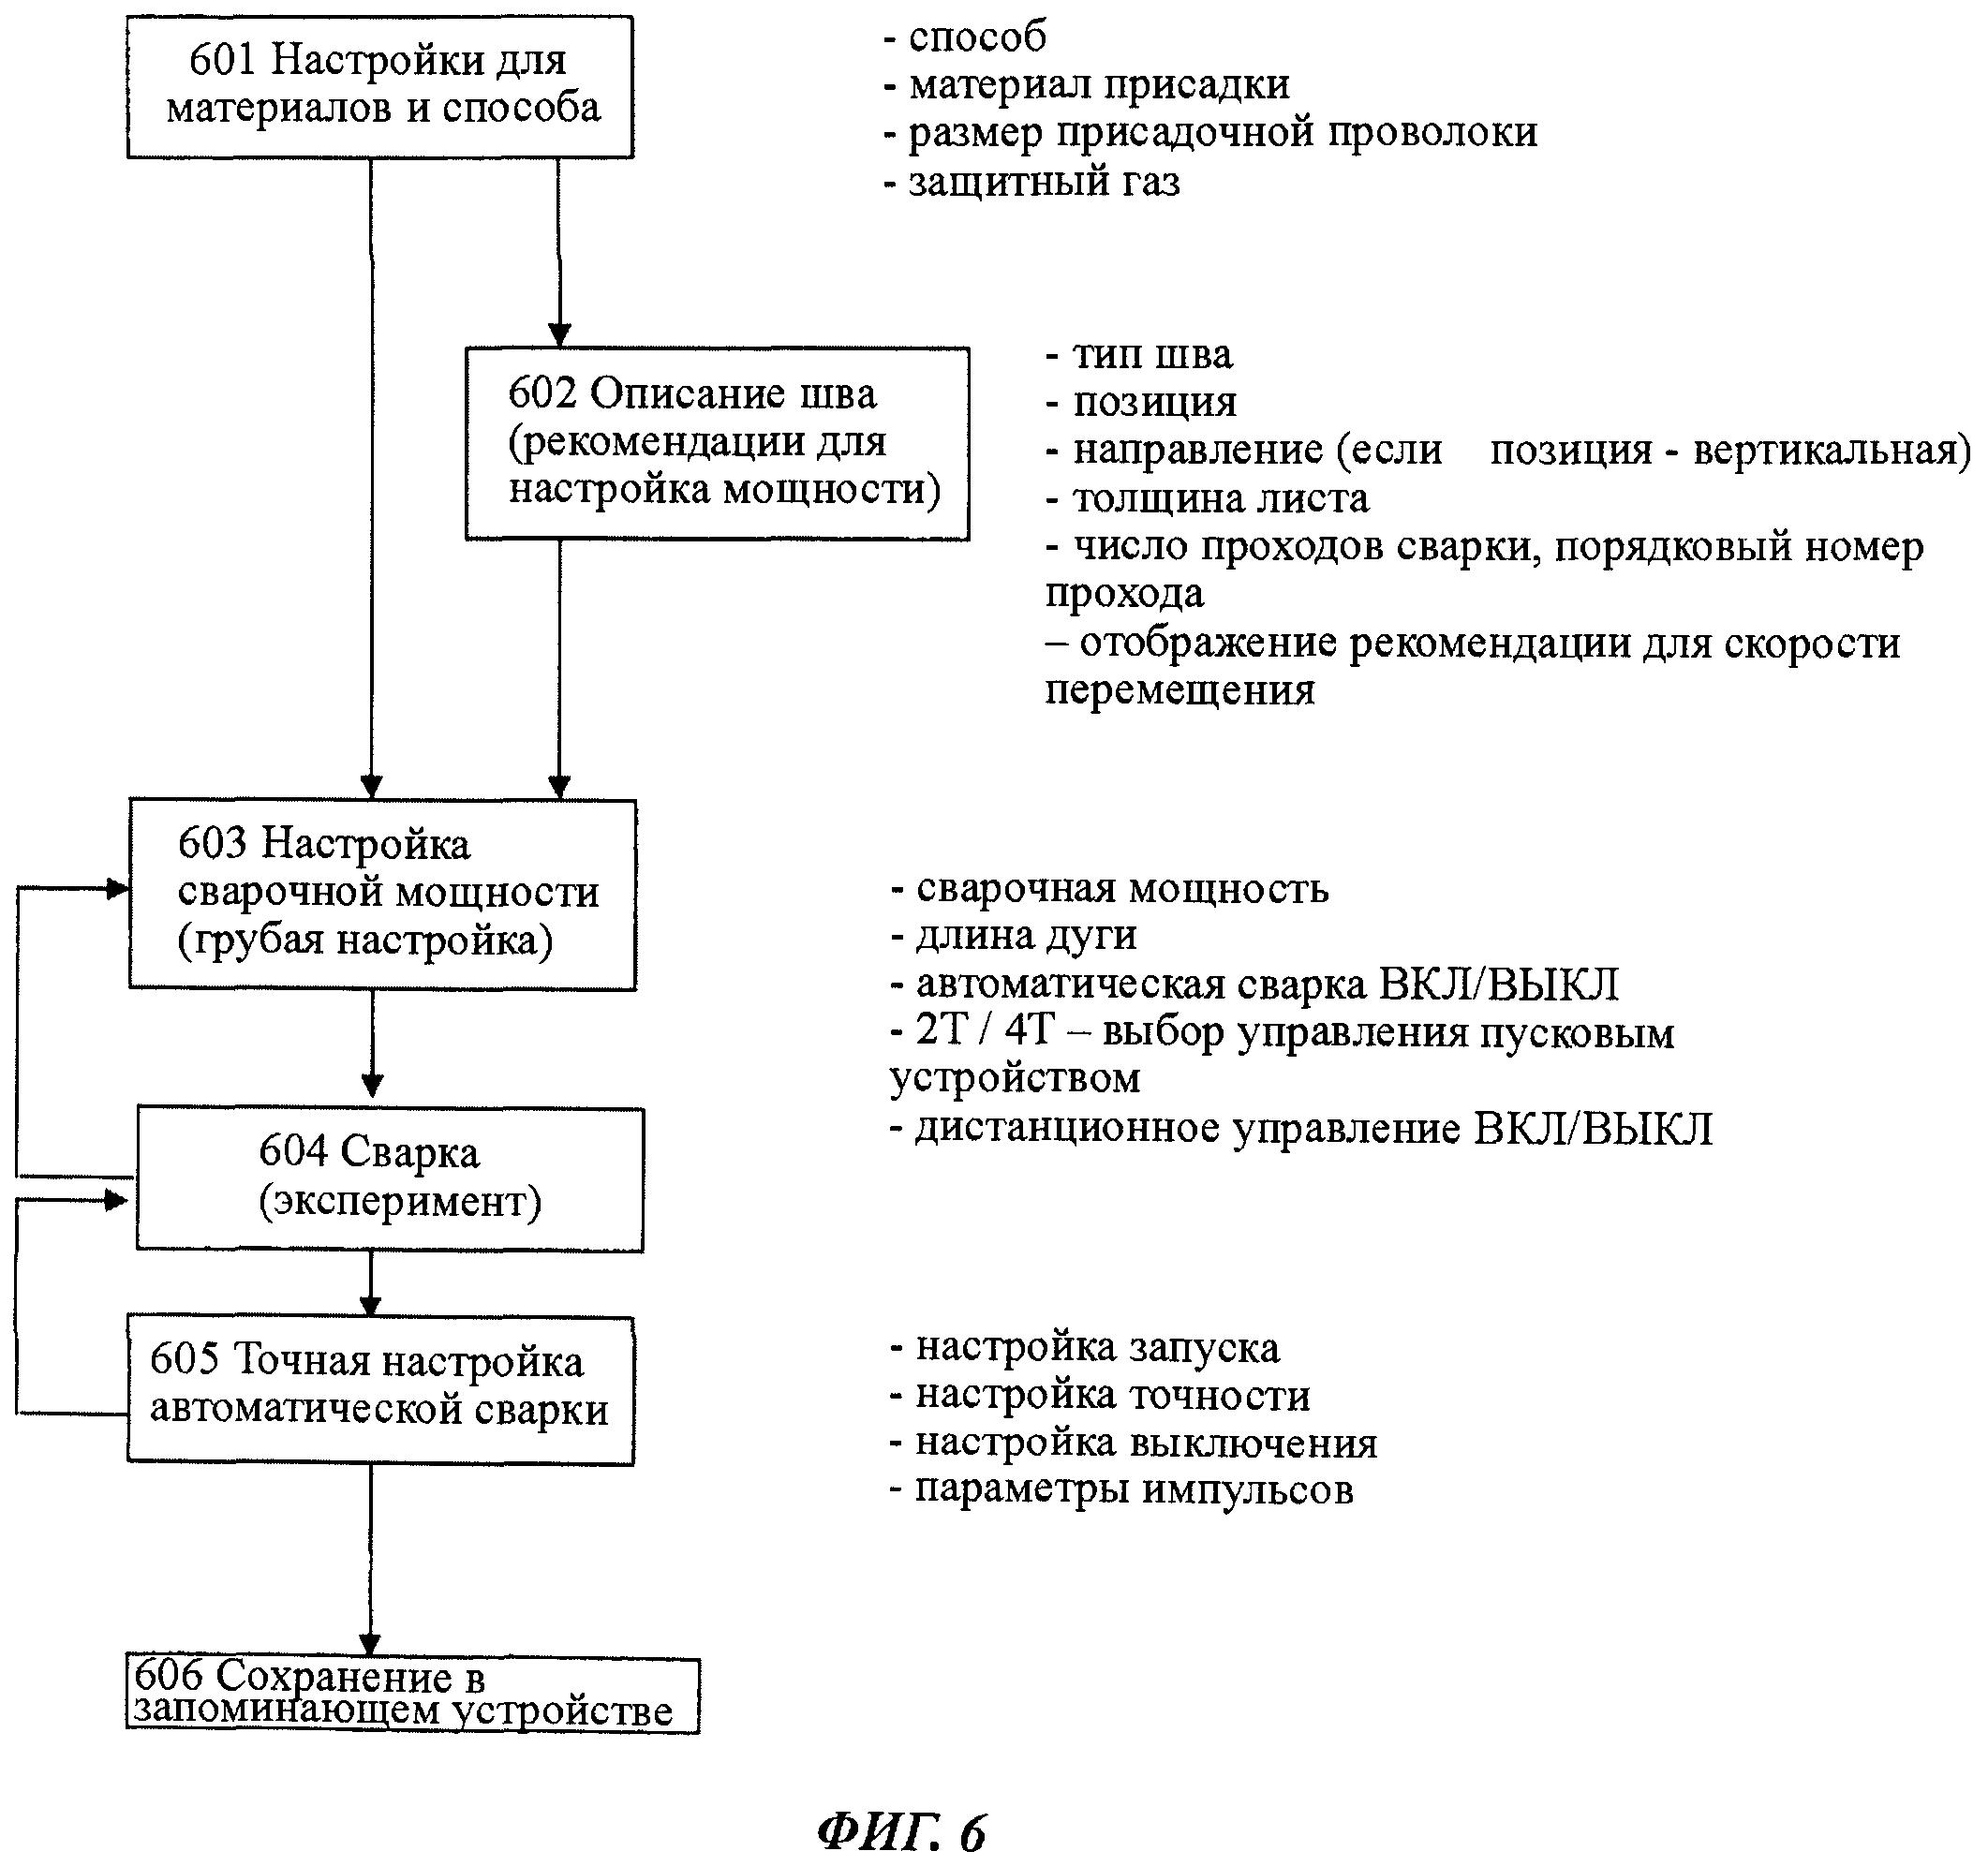 Устройство для оптимизации процесса сварки